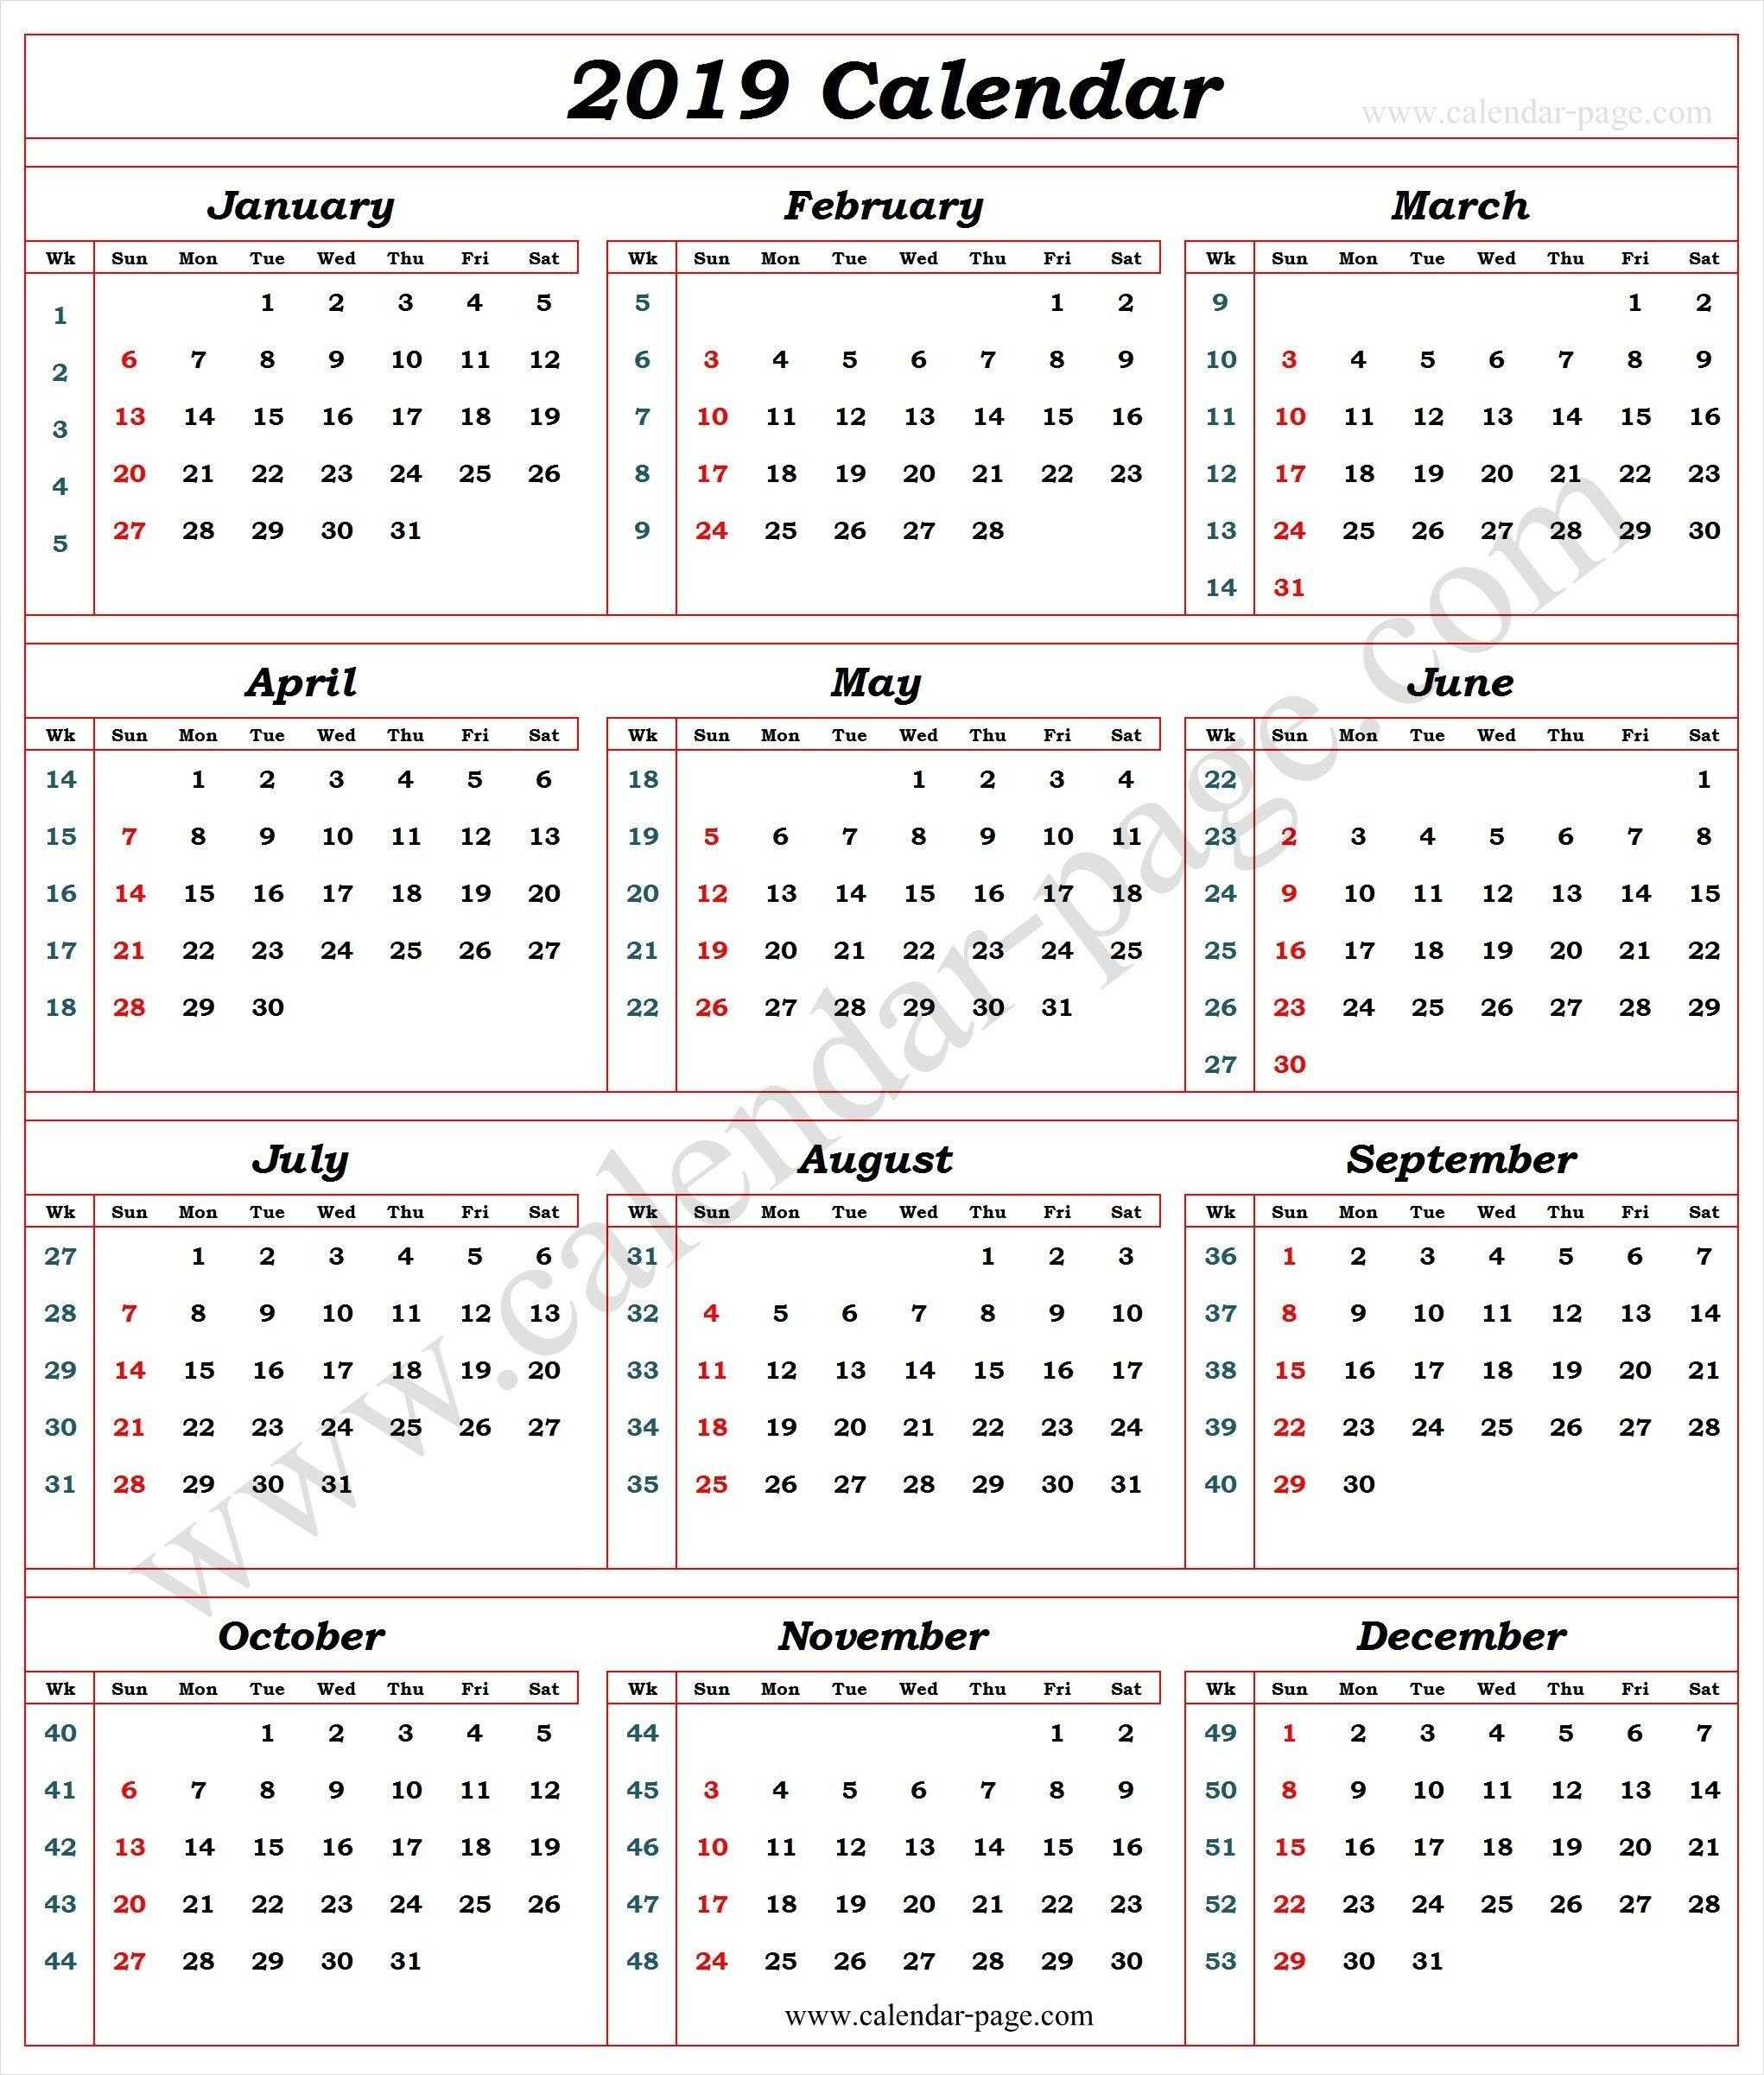 Calendar 2019 With Week Numbers | 2019 Calendar Template | Pinterest Week 5 Calendar 2019